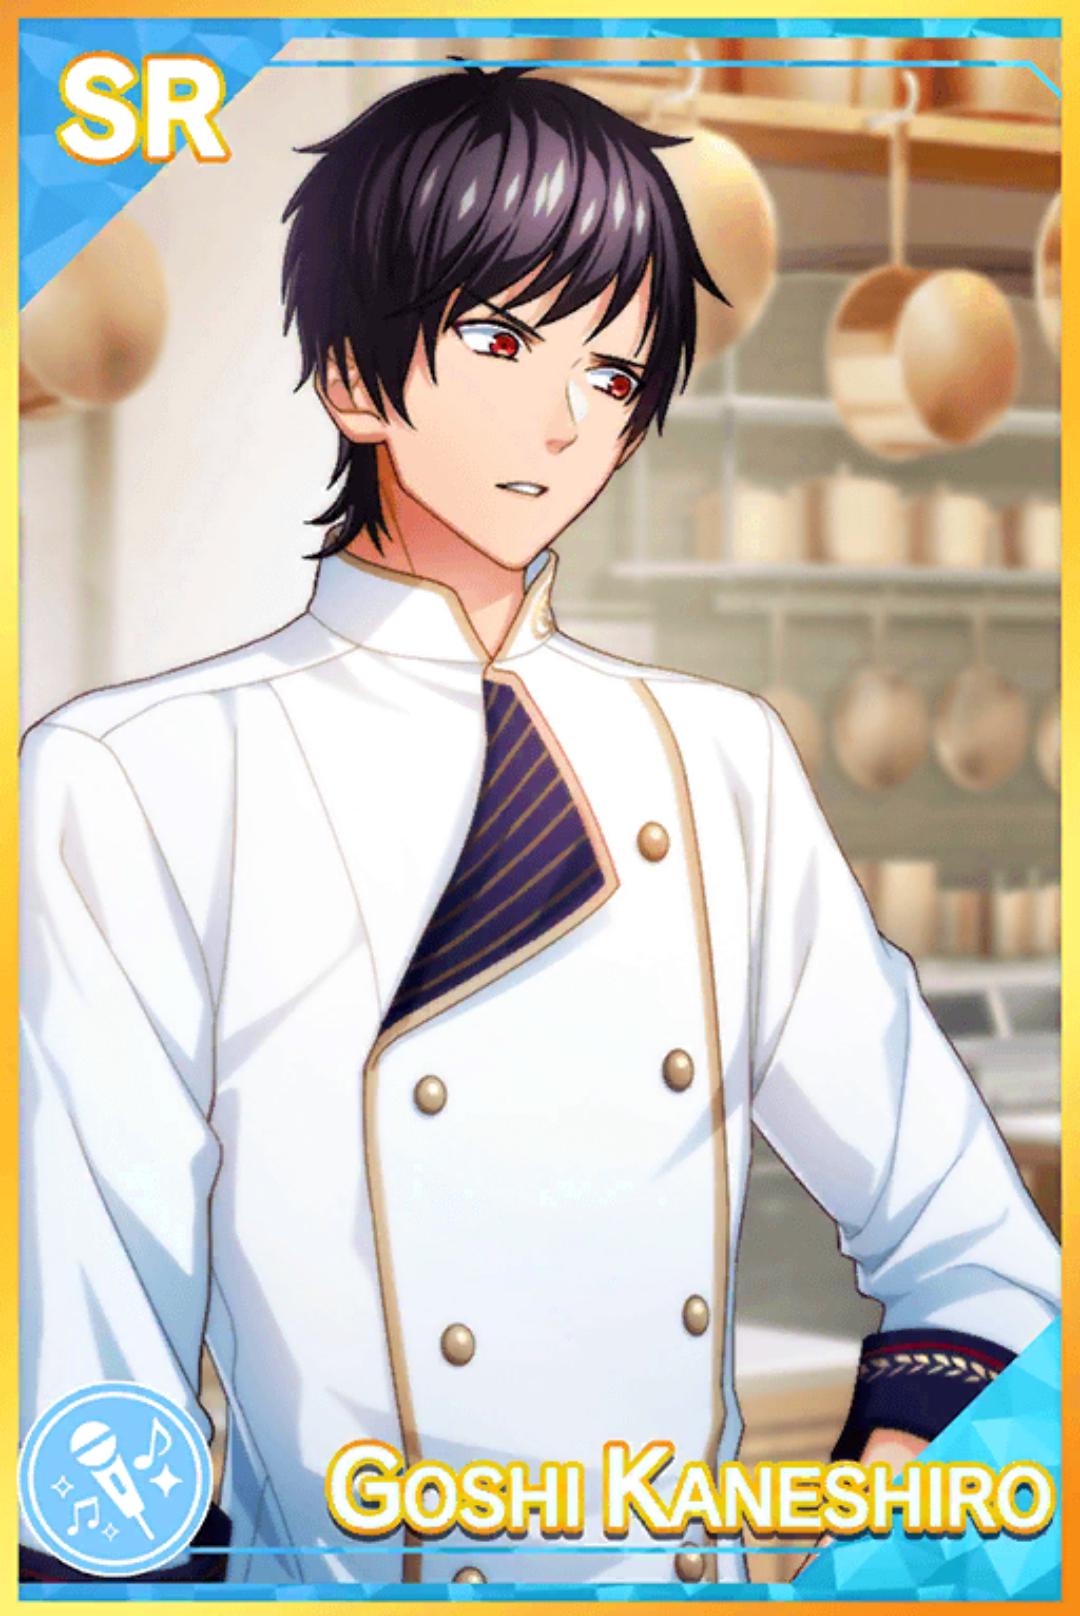 【Dangerous Chef】Kaneshiro Goshi